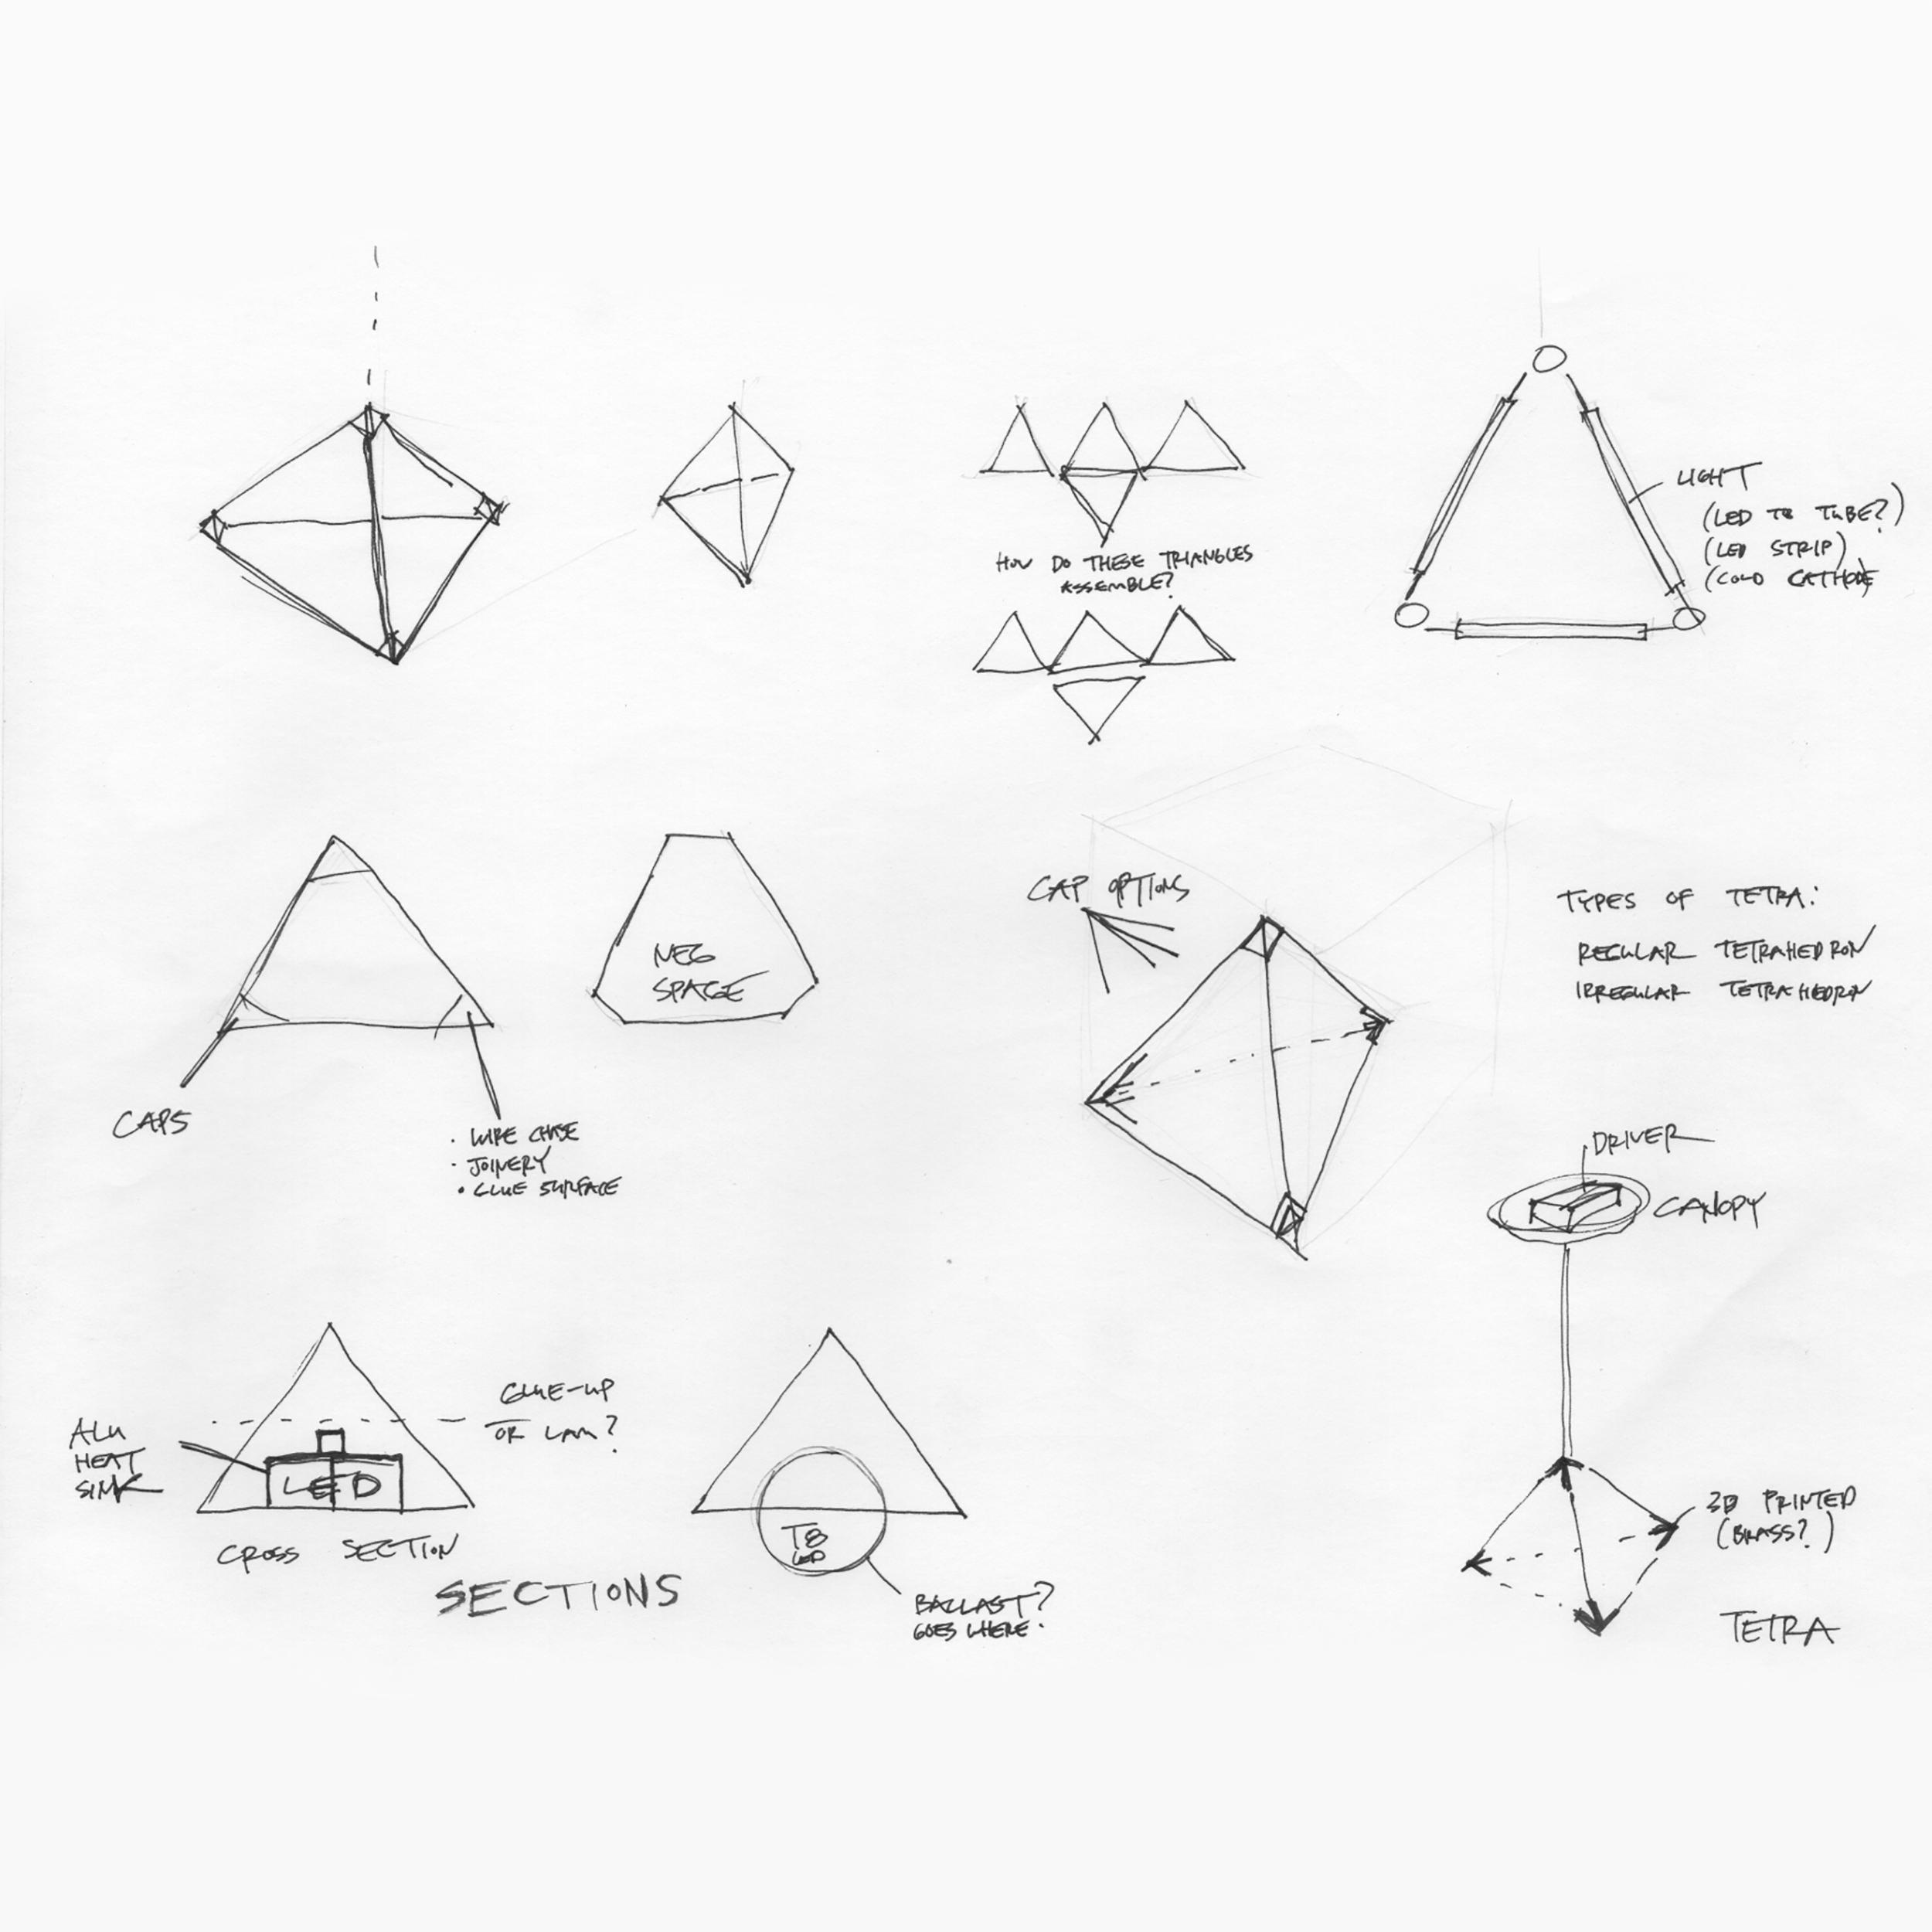 lighting-designer-and-design-ideas